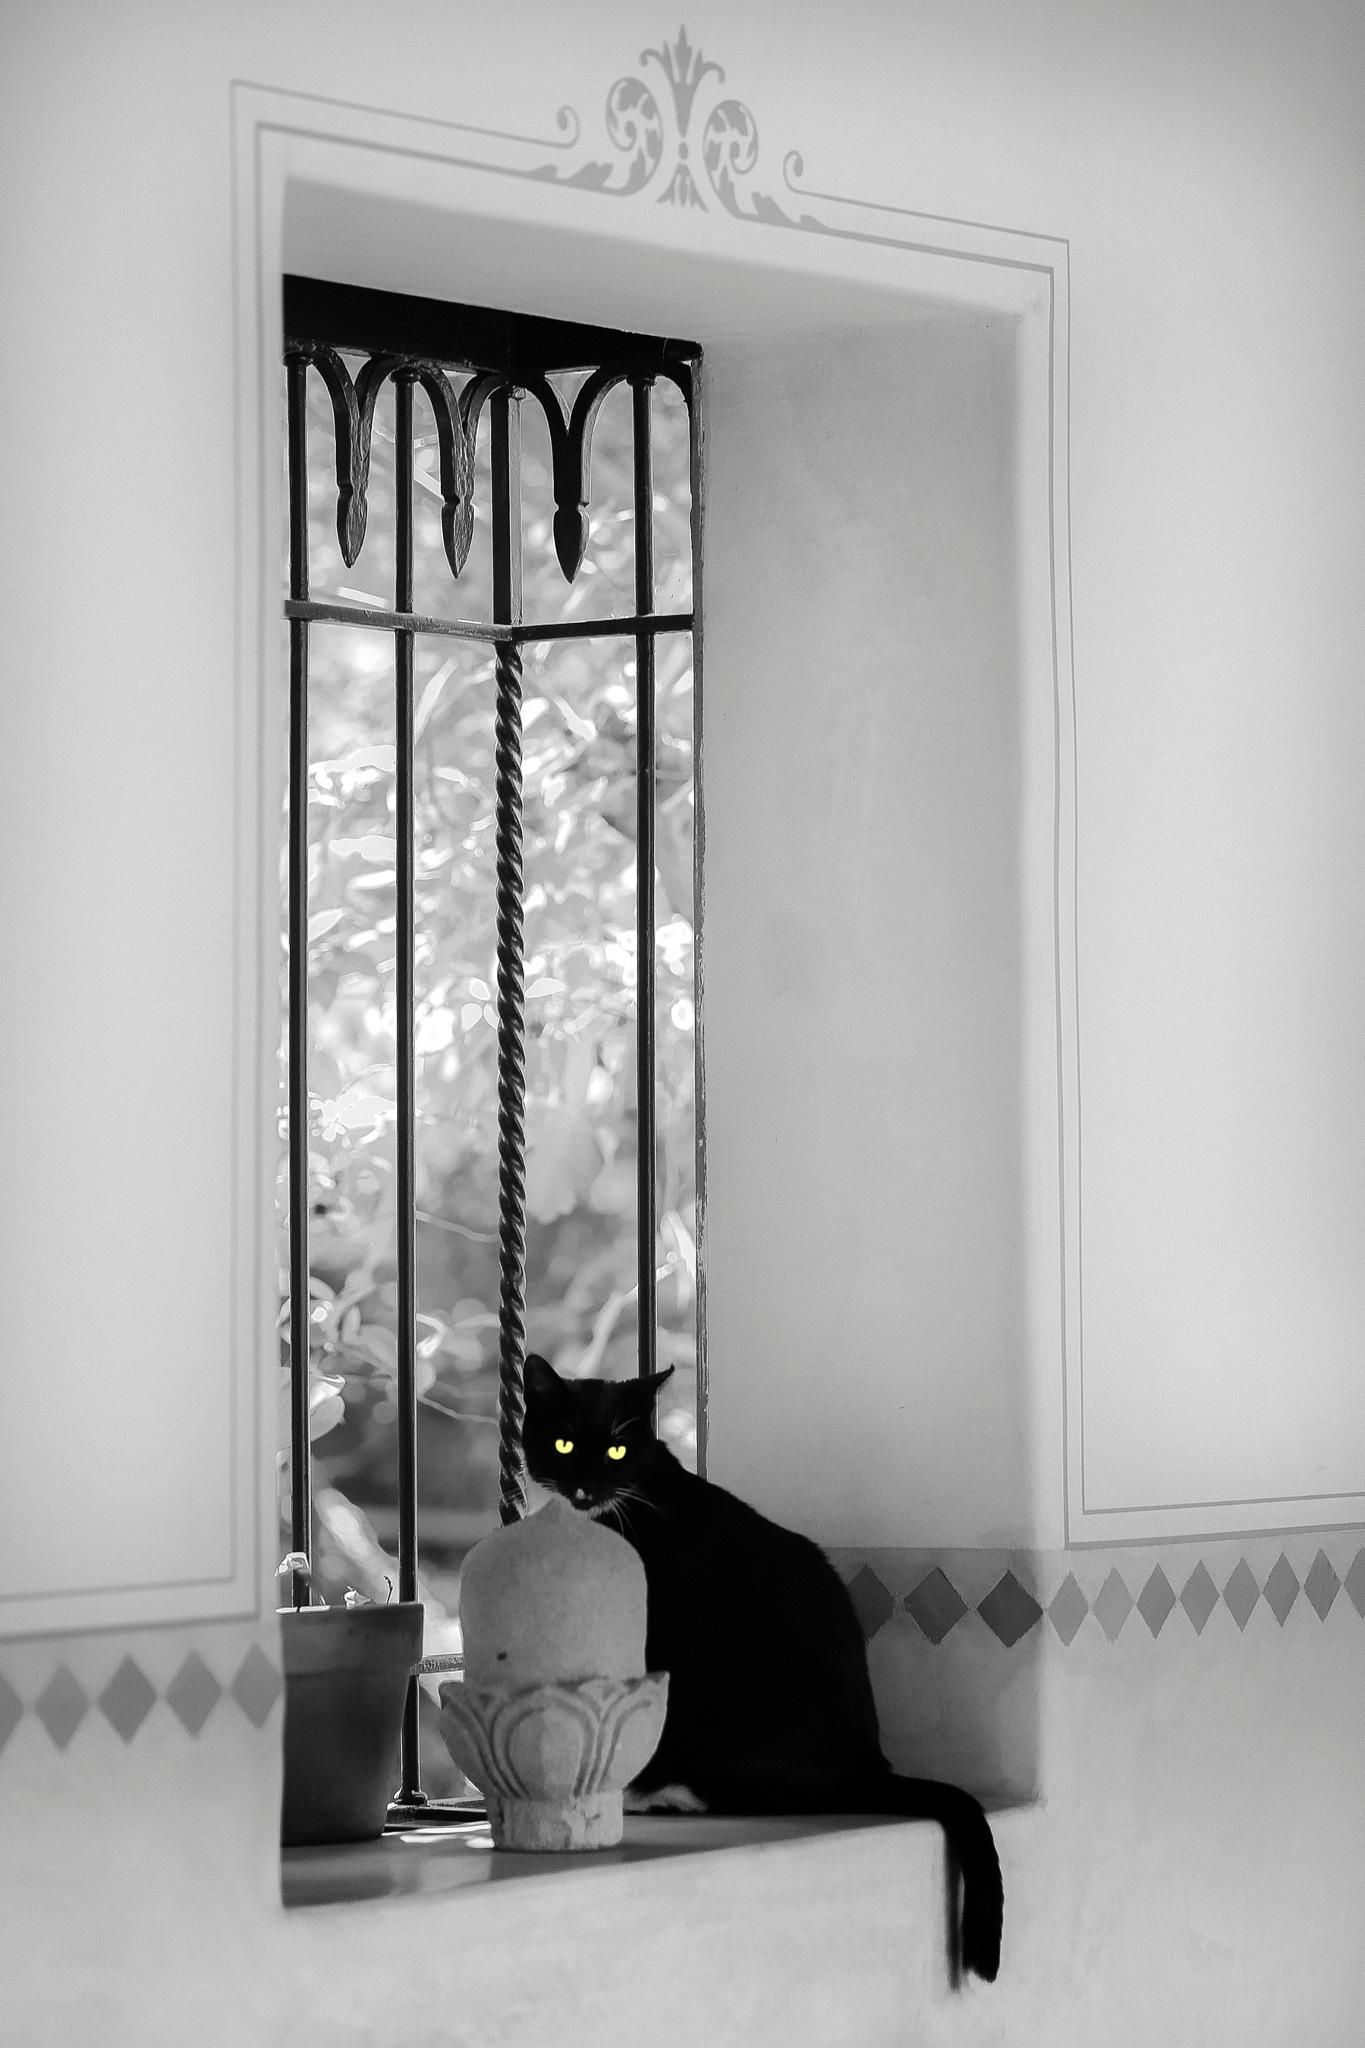 the watcher by Zane Levitt